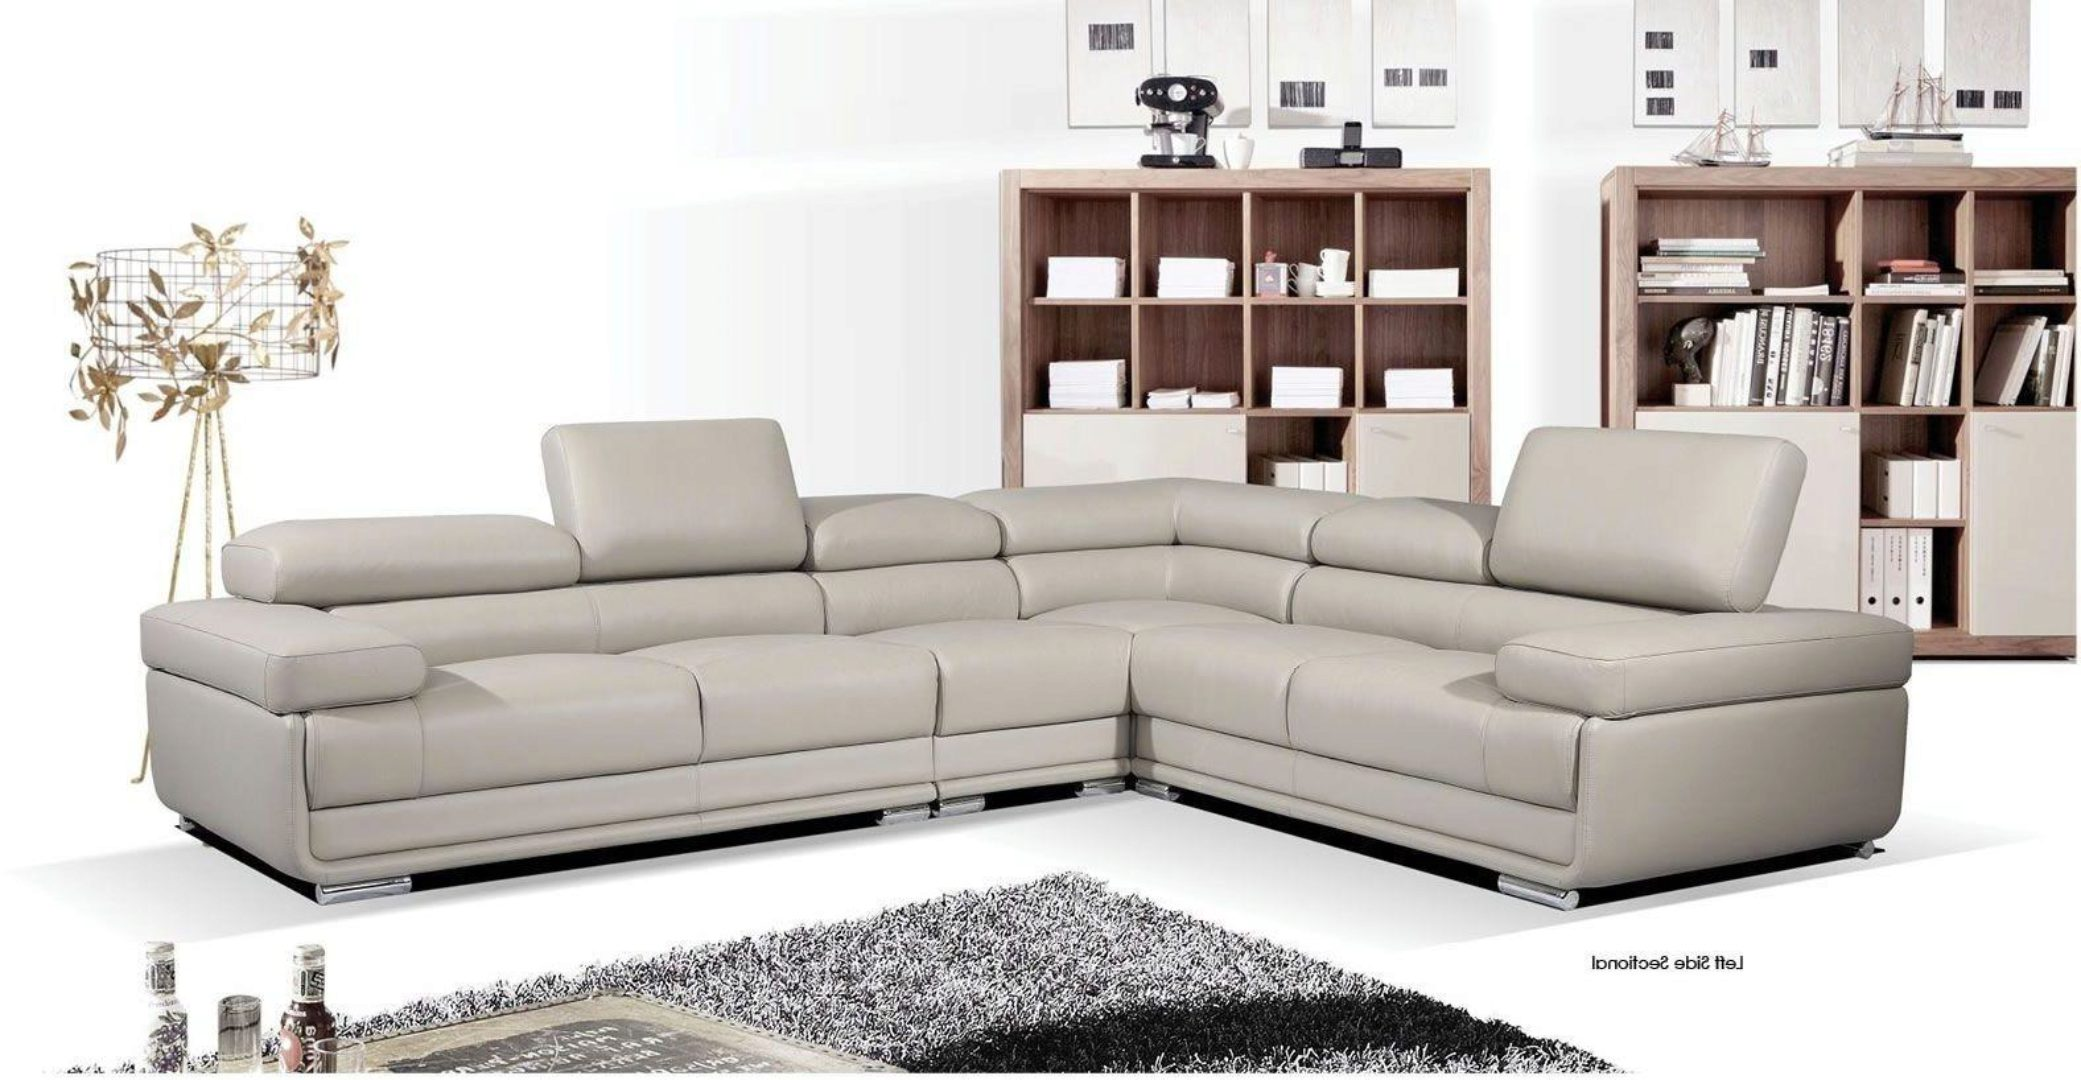 esf furniture catalog buy cheap